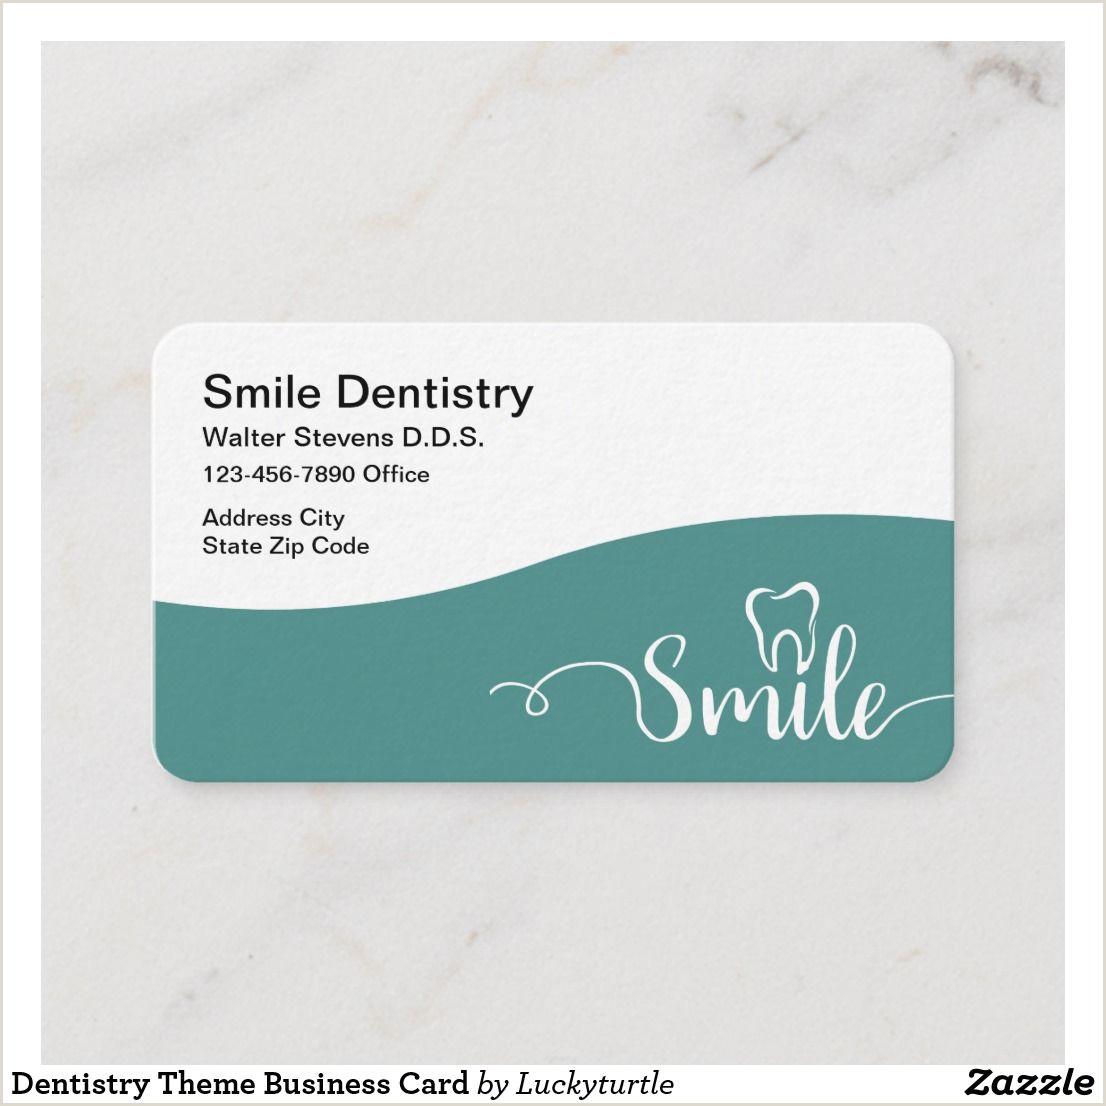 Unique Dentist Business Cards Dentistry Theme Business Card Zazzle